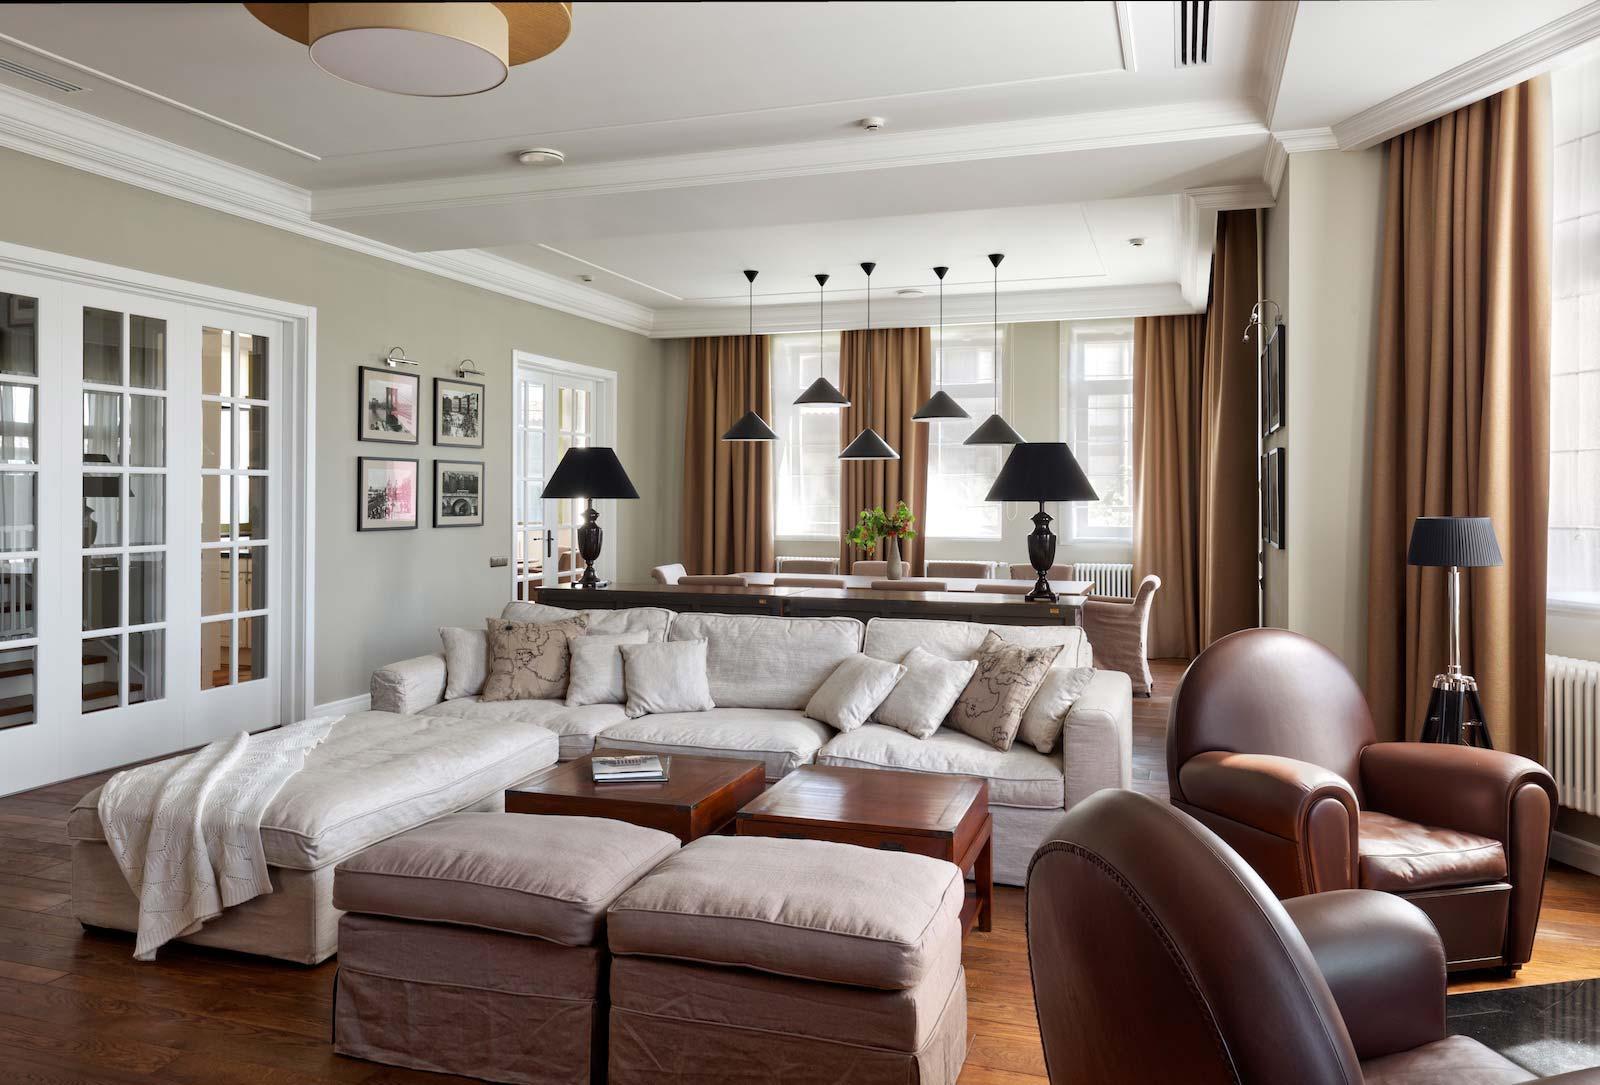 Interni Case Stile Inglese : Porte in stile inglese per una casa new classic u2022 garofoli